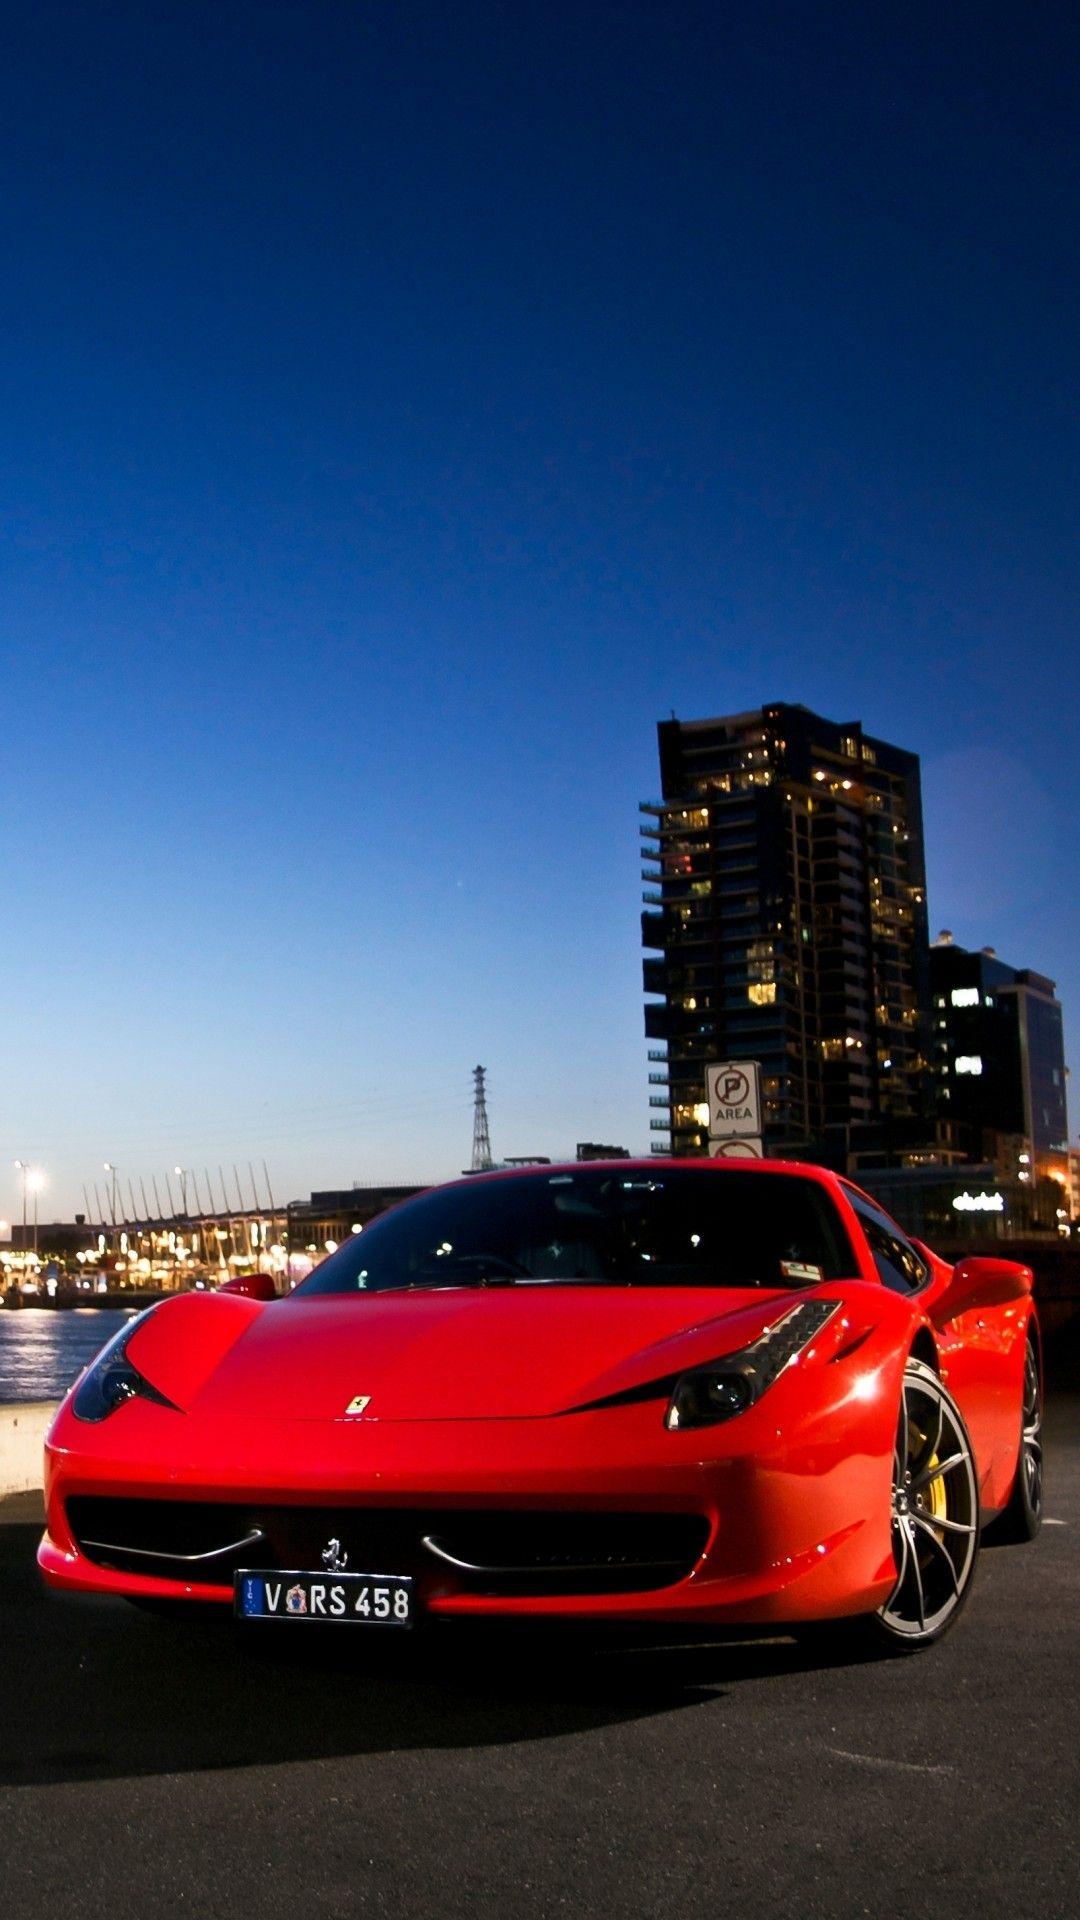 Ferrari Wallpaper Iphonex スマホ壁紙 待受画像ギャラリー 車の壁紙 スカイラインgtr R34 フェラーリ 458